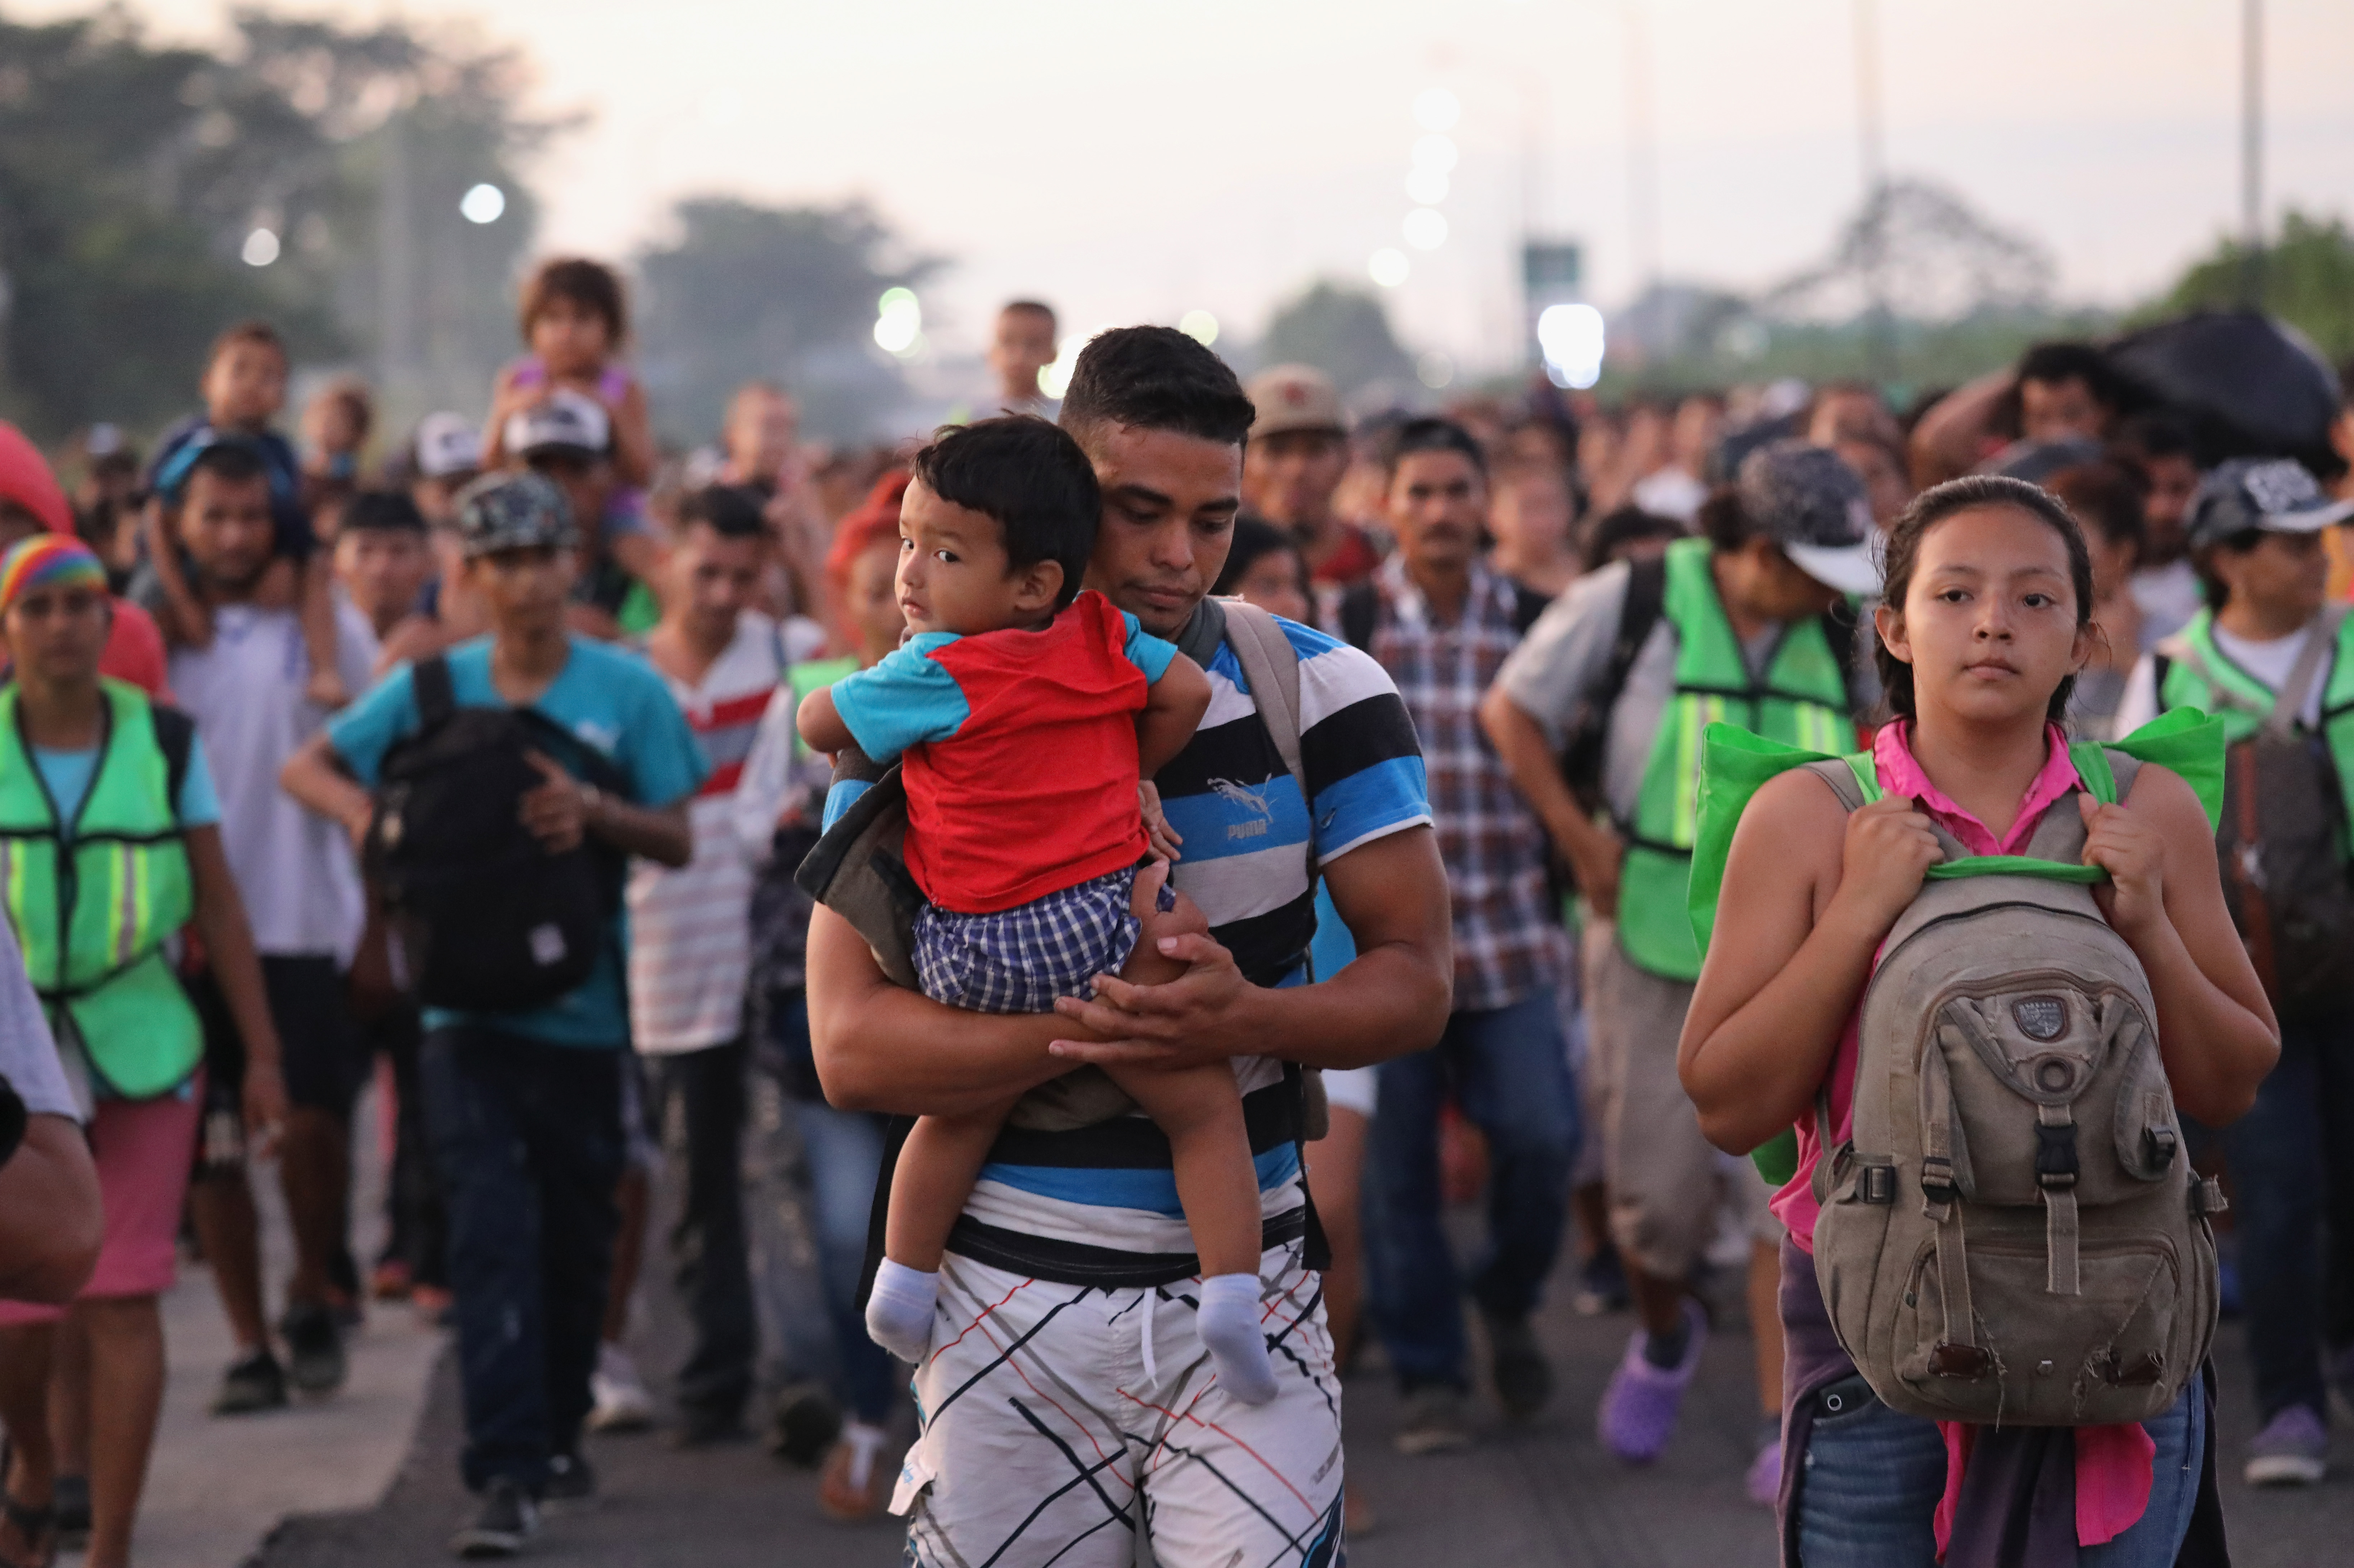 The migrant caravan, explained